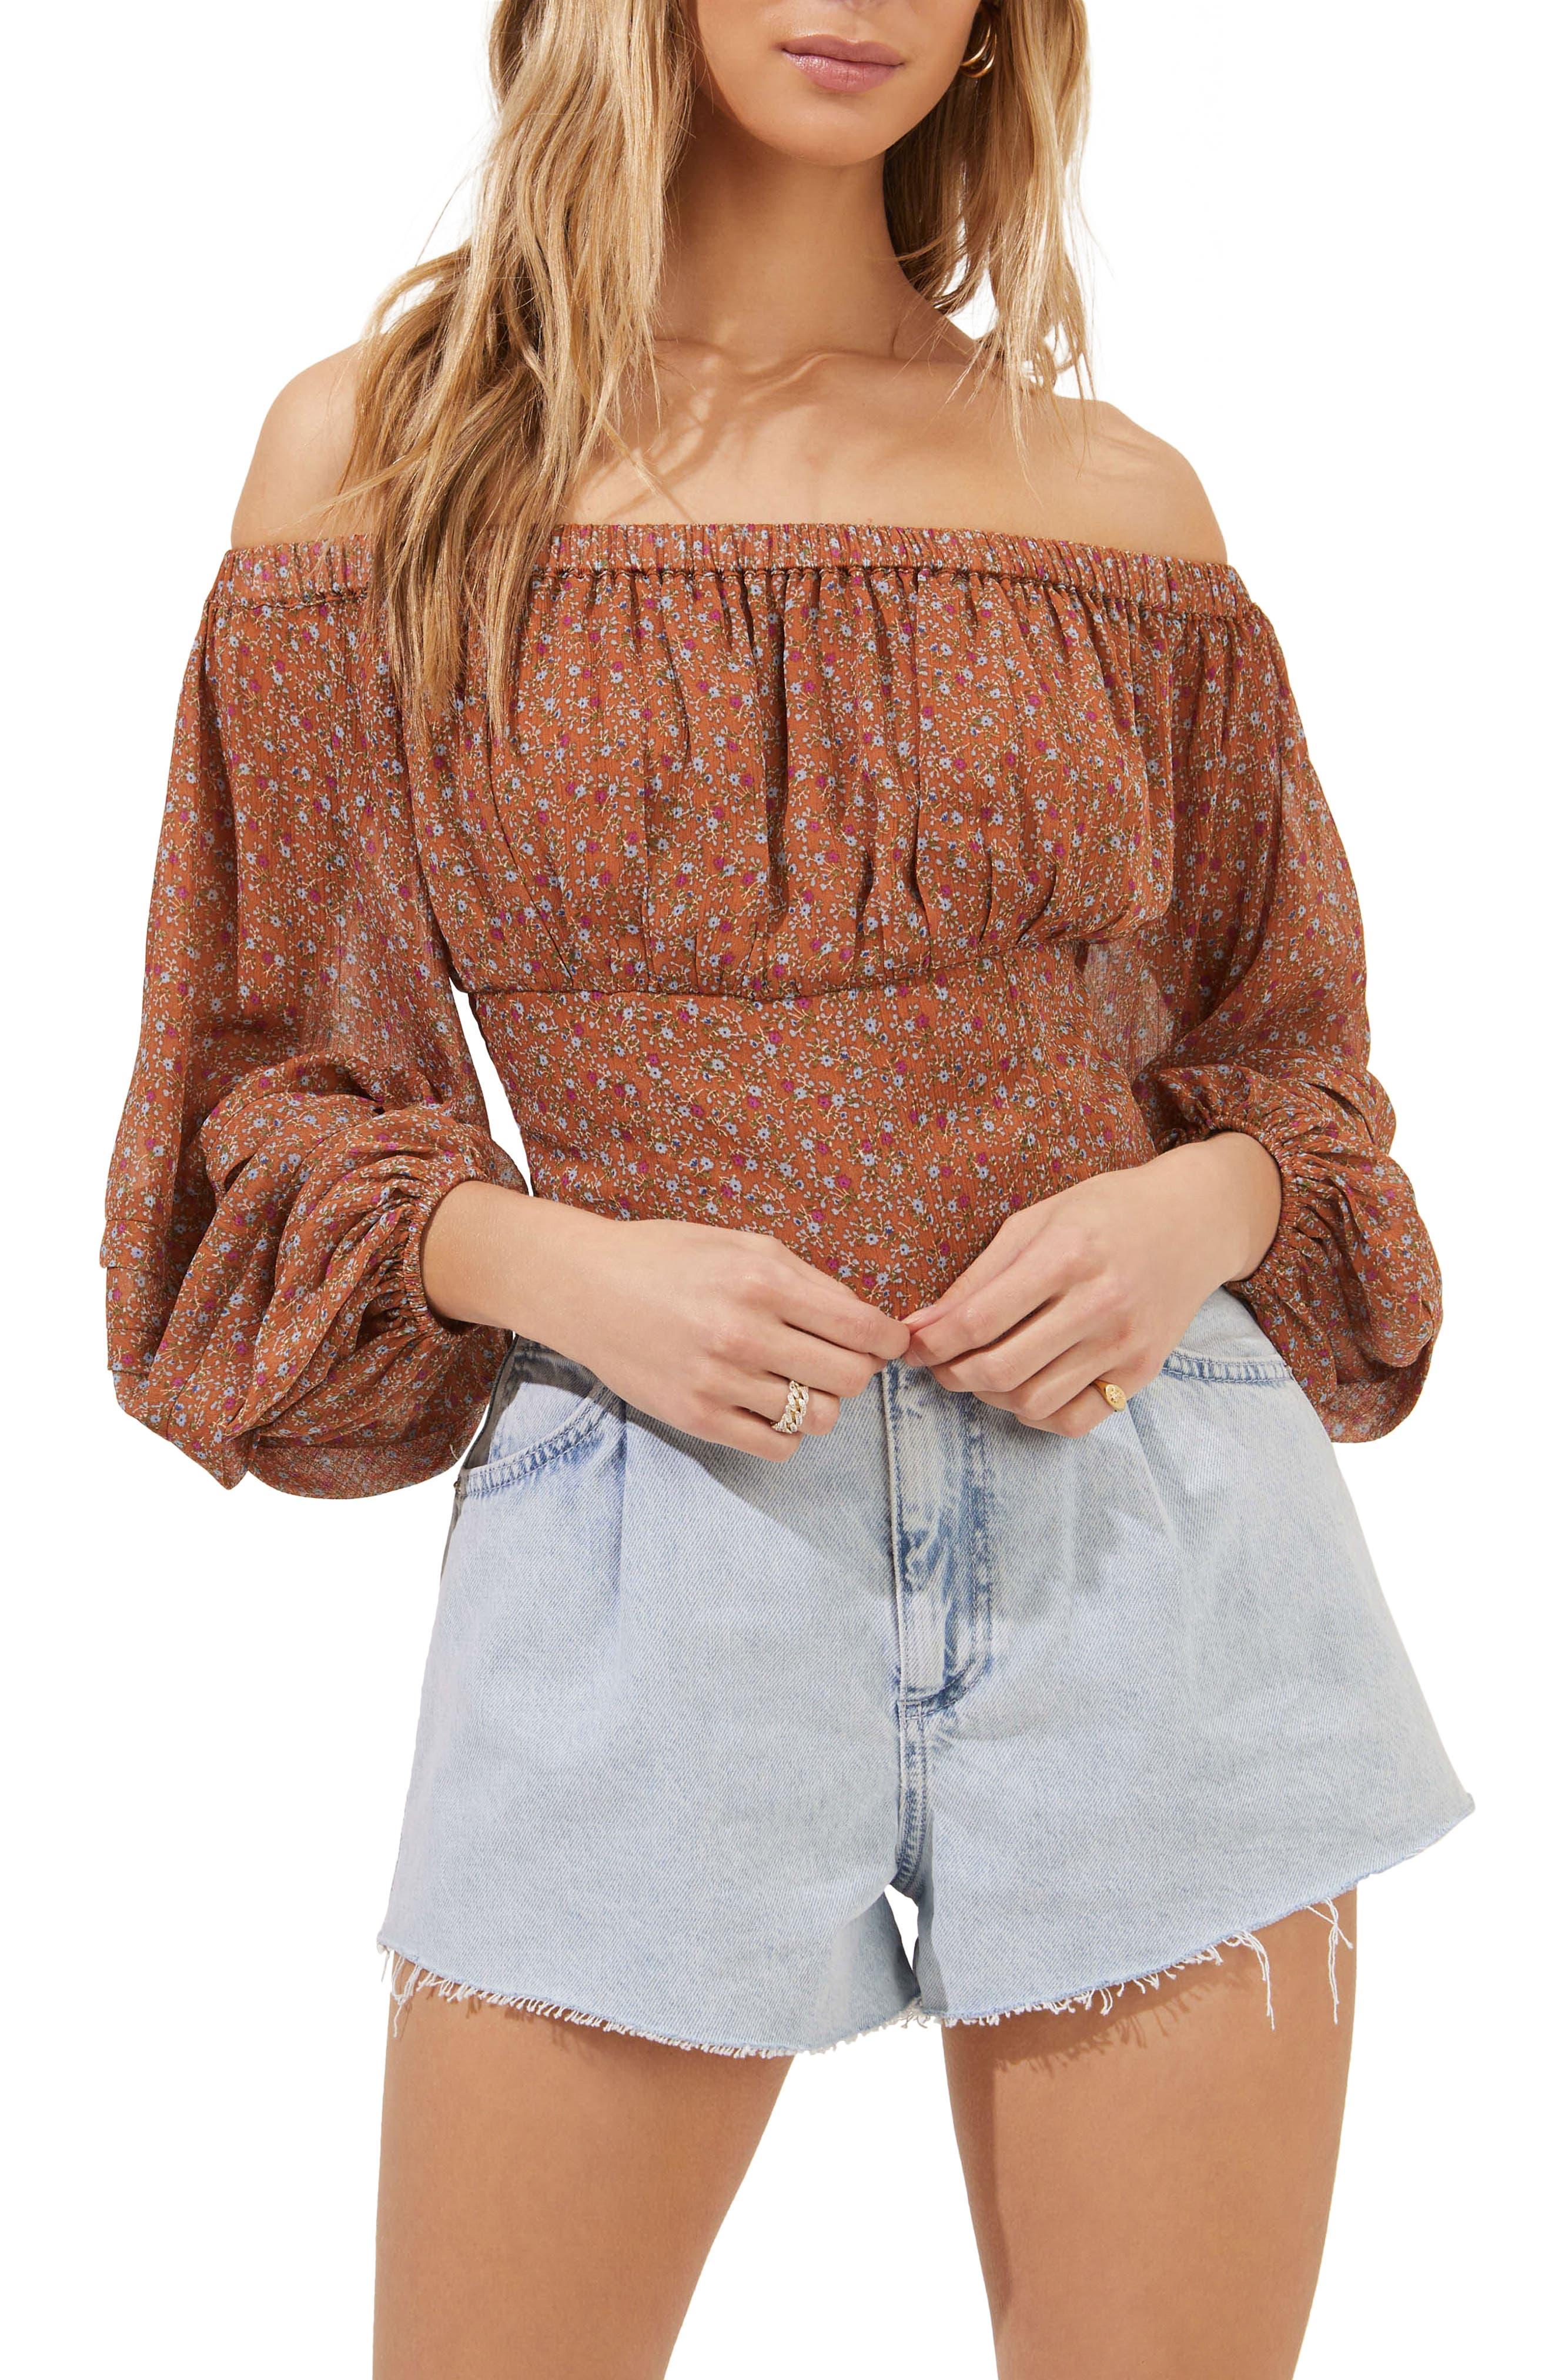 UK Women Short Sleeve T-Shirts Dot Print Tee Tops Girls Off Shoulder Crop Tops